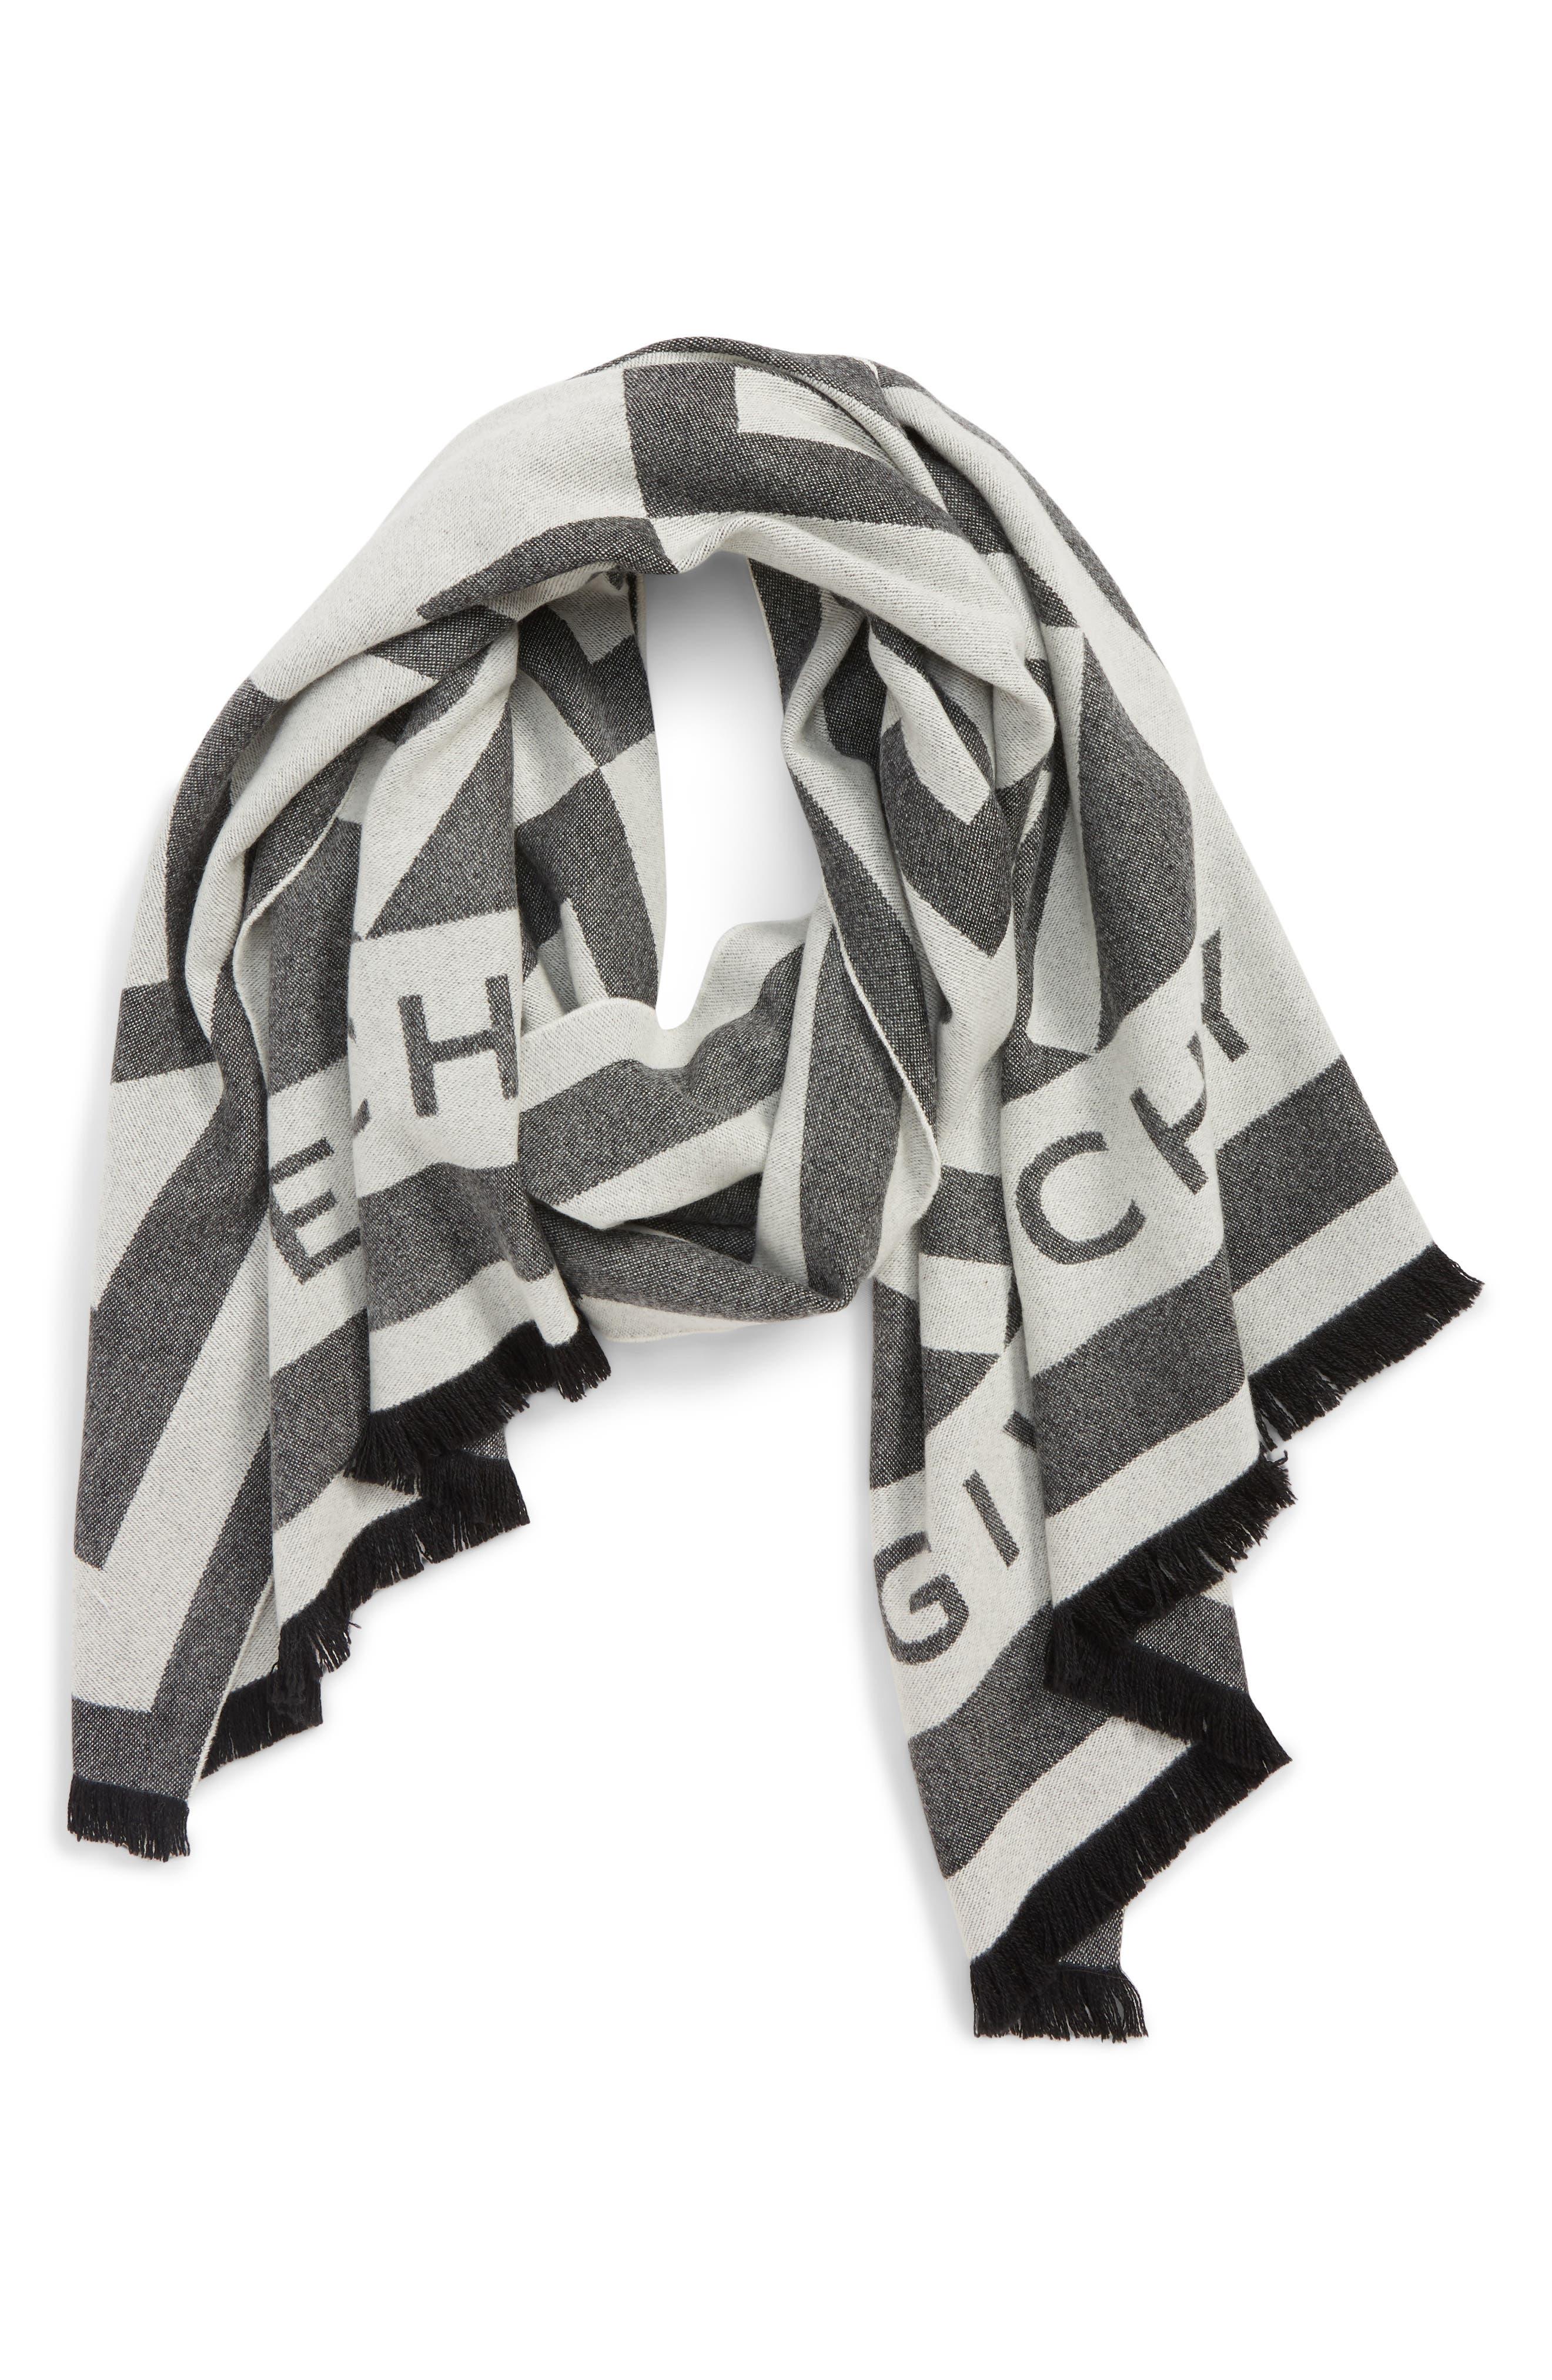 GIVENCHY,                             Nouveau G Wool & Cashmere Scarf,                             Main thumbnail 1, color,                             BLACK/ WHITE